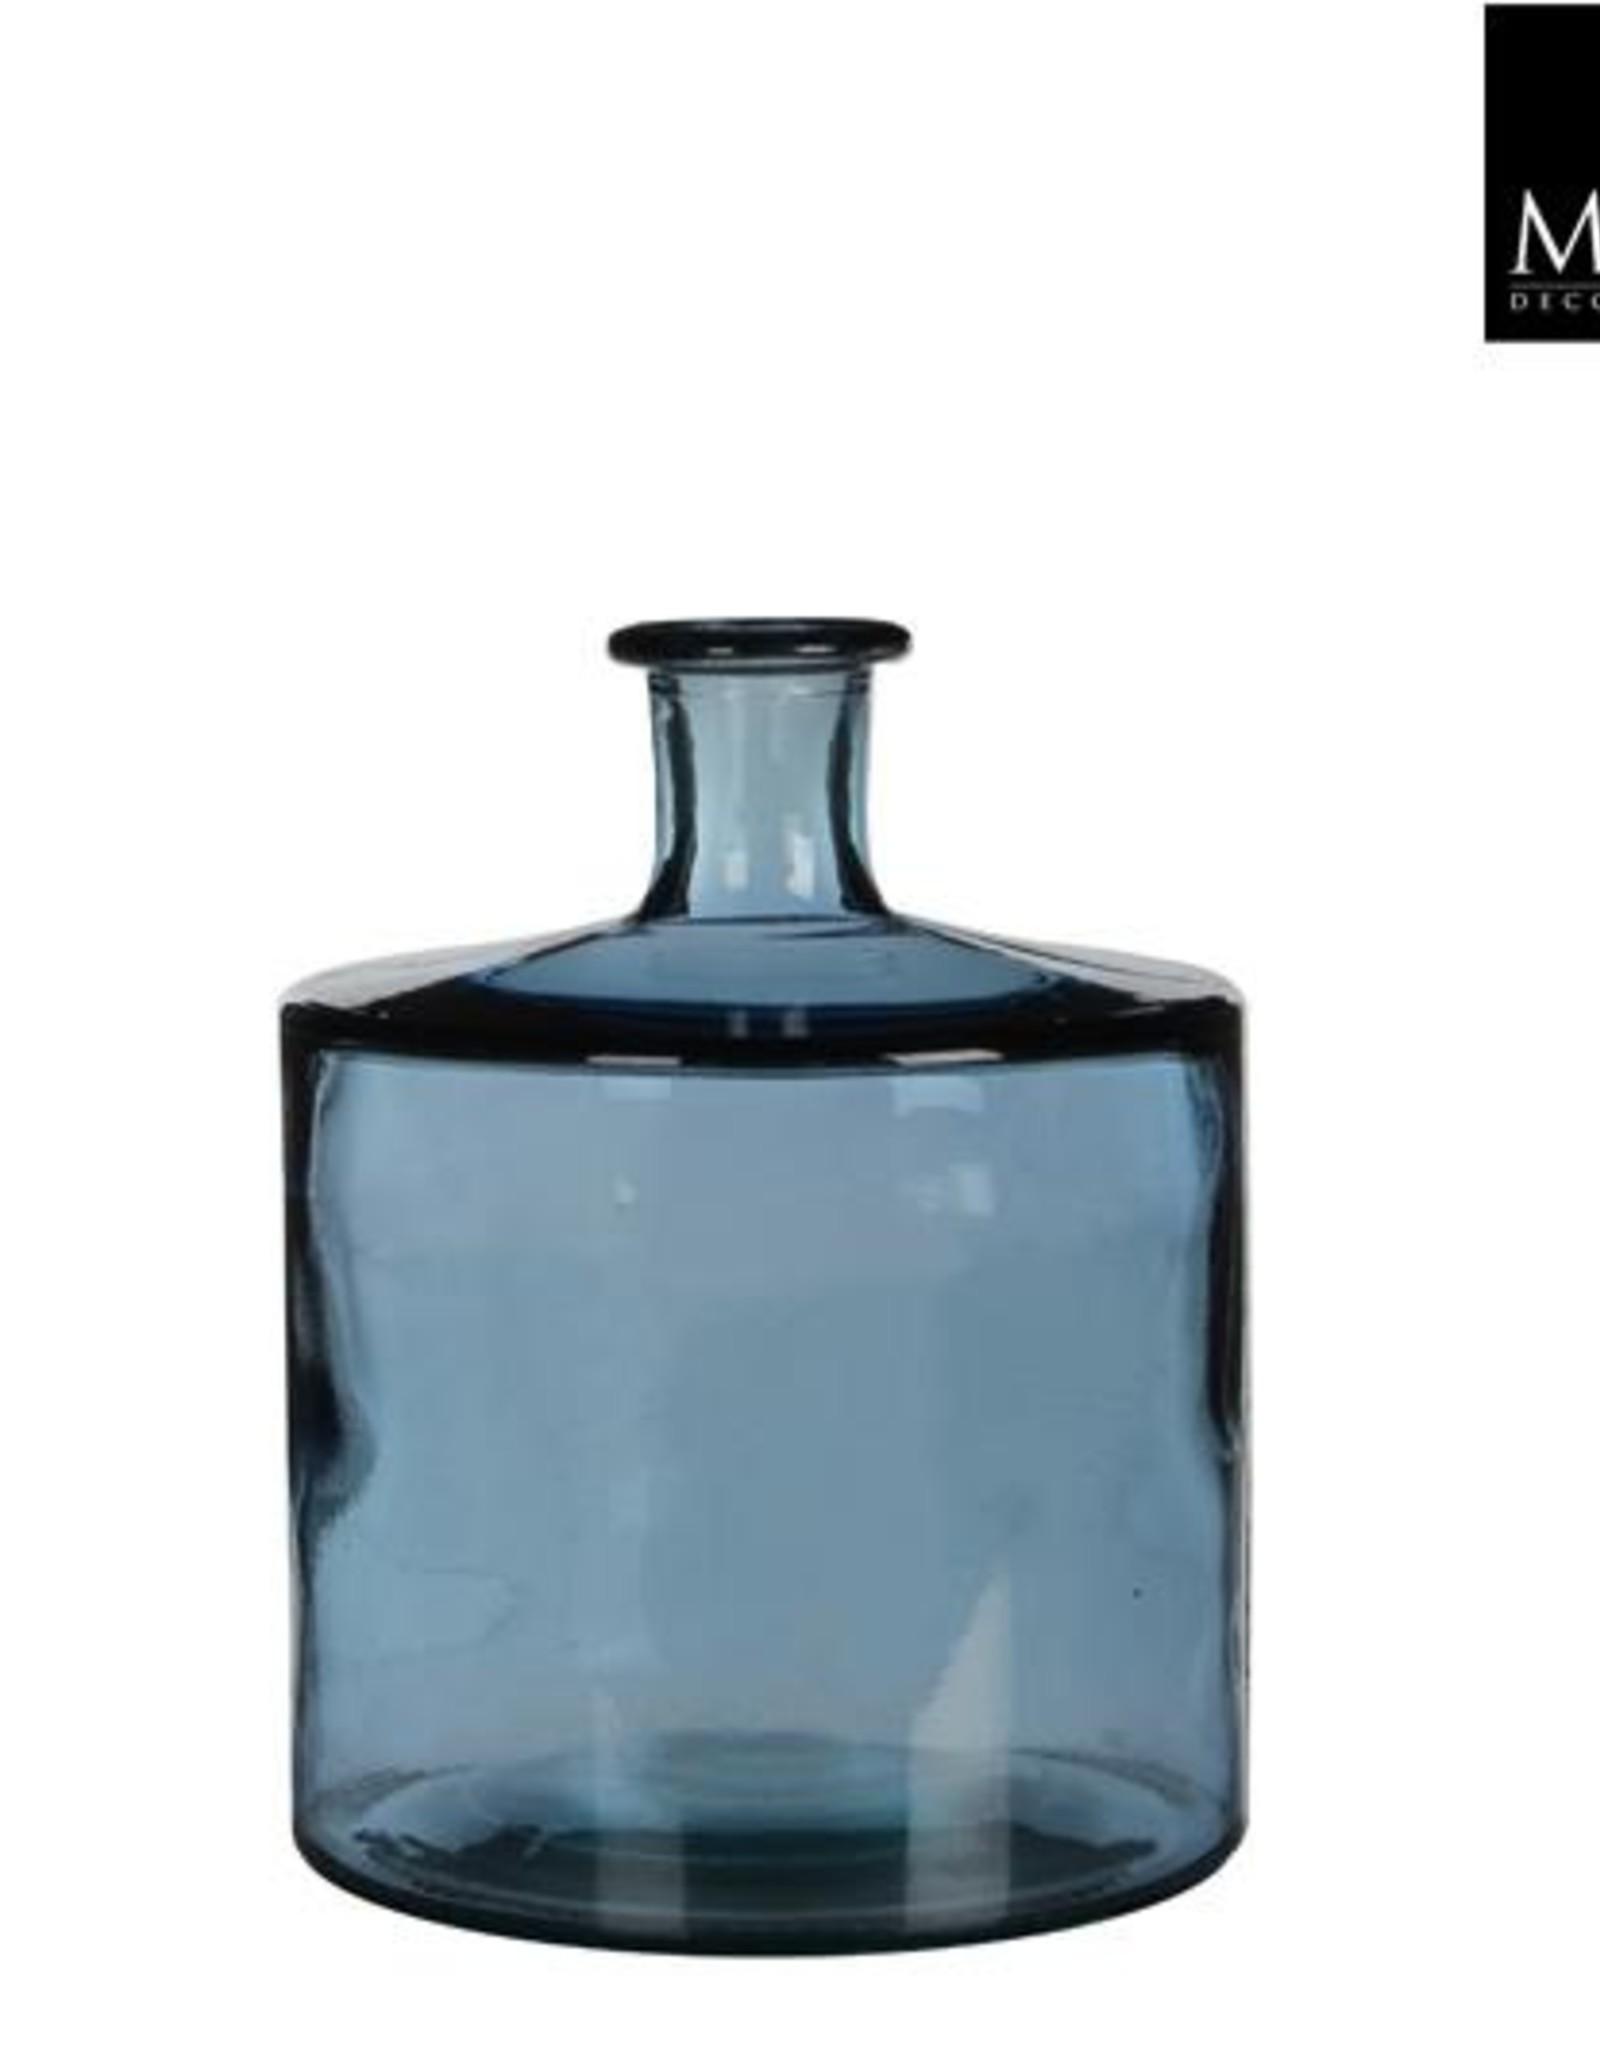 Guan fles blauw